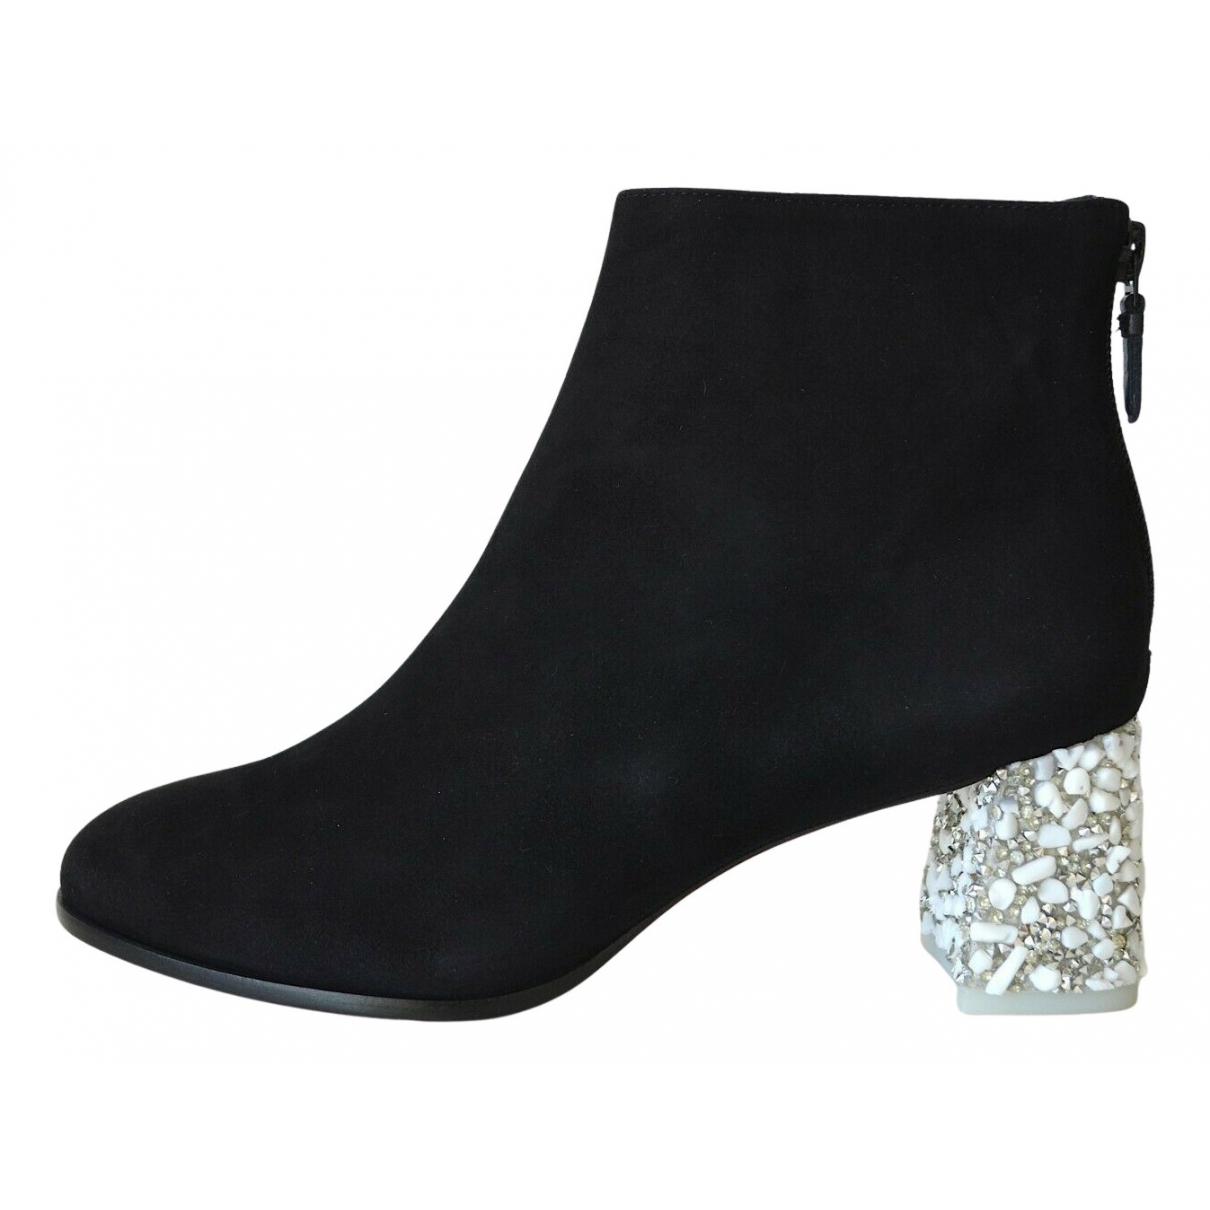 Sophia Webster N Black Suede Ankle boots for Women 38 EU